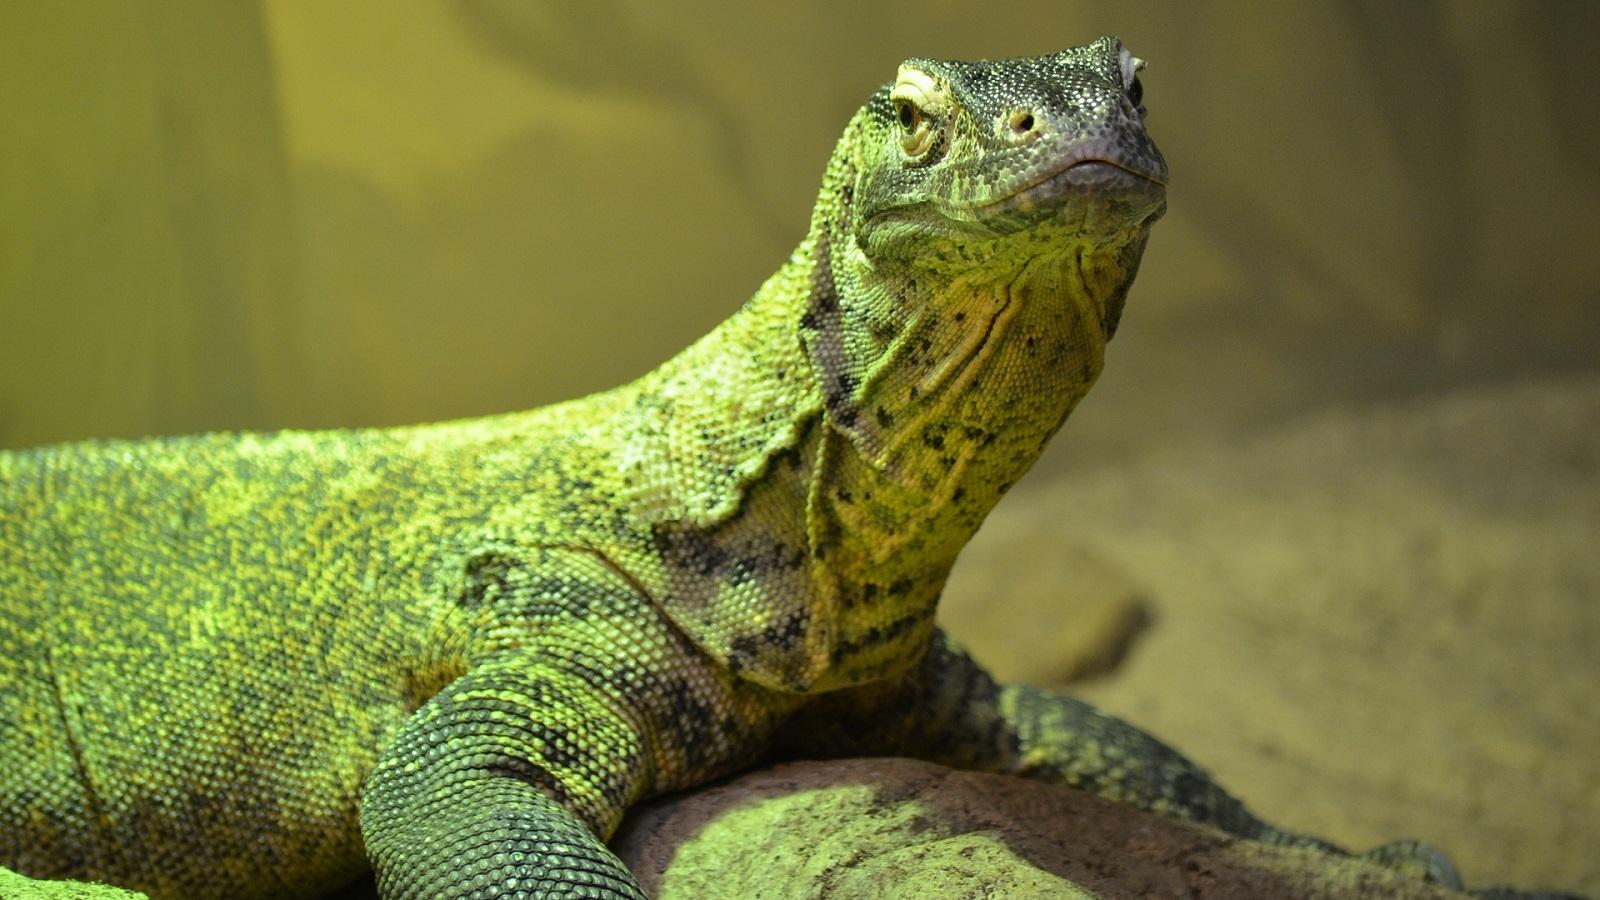 10 Fantastic Hd Komodo Dragon Wallpapers